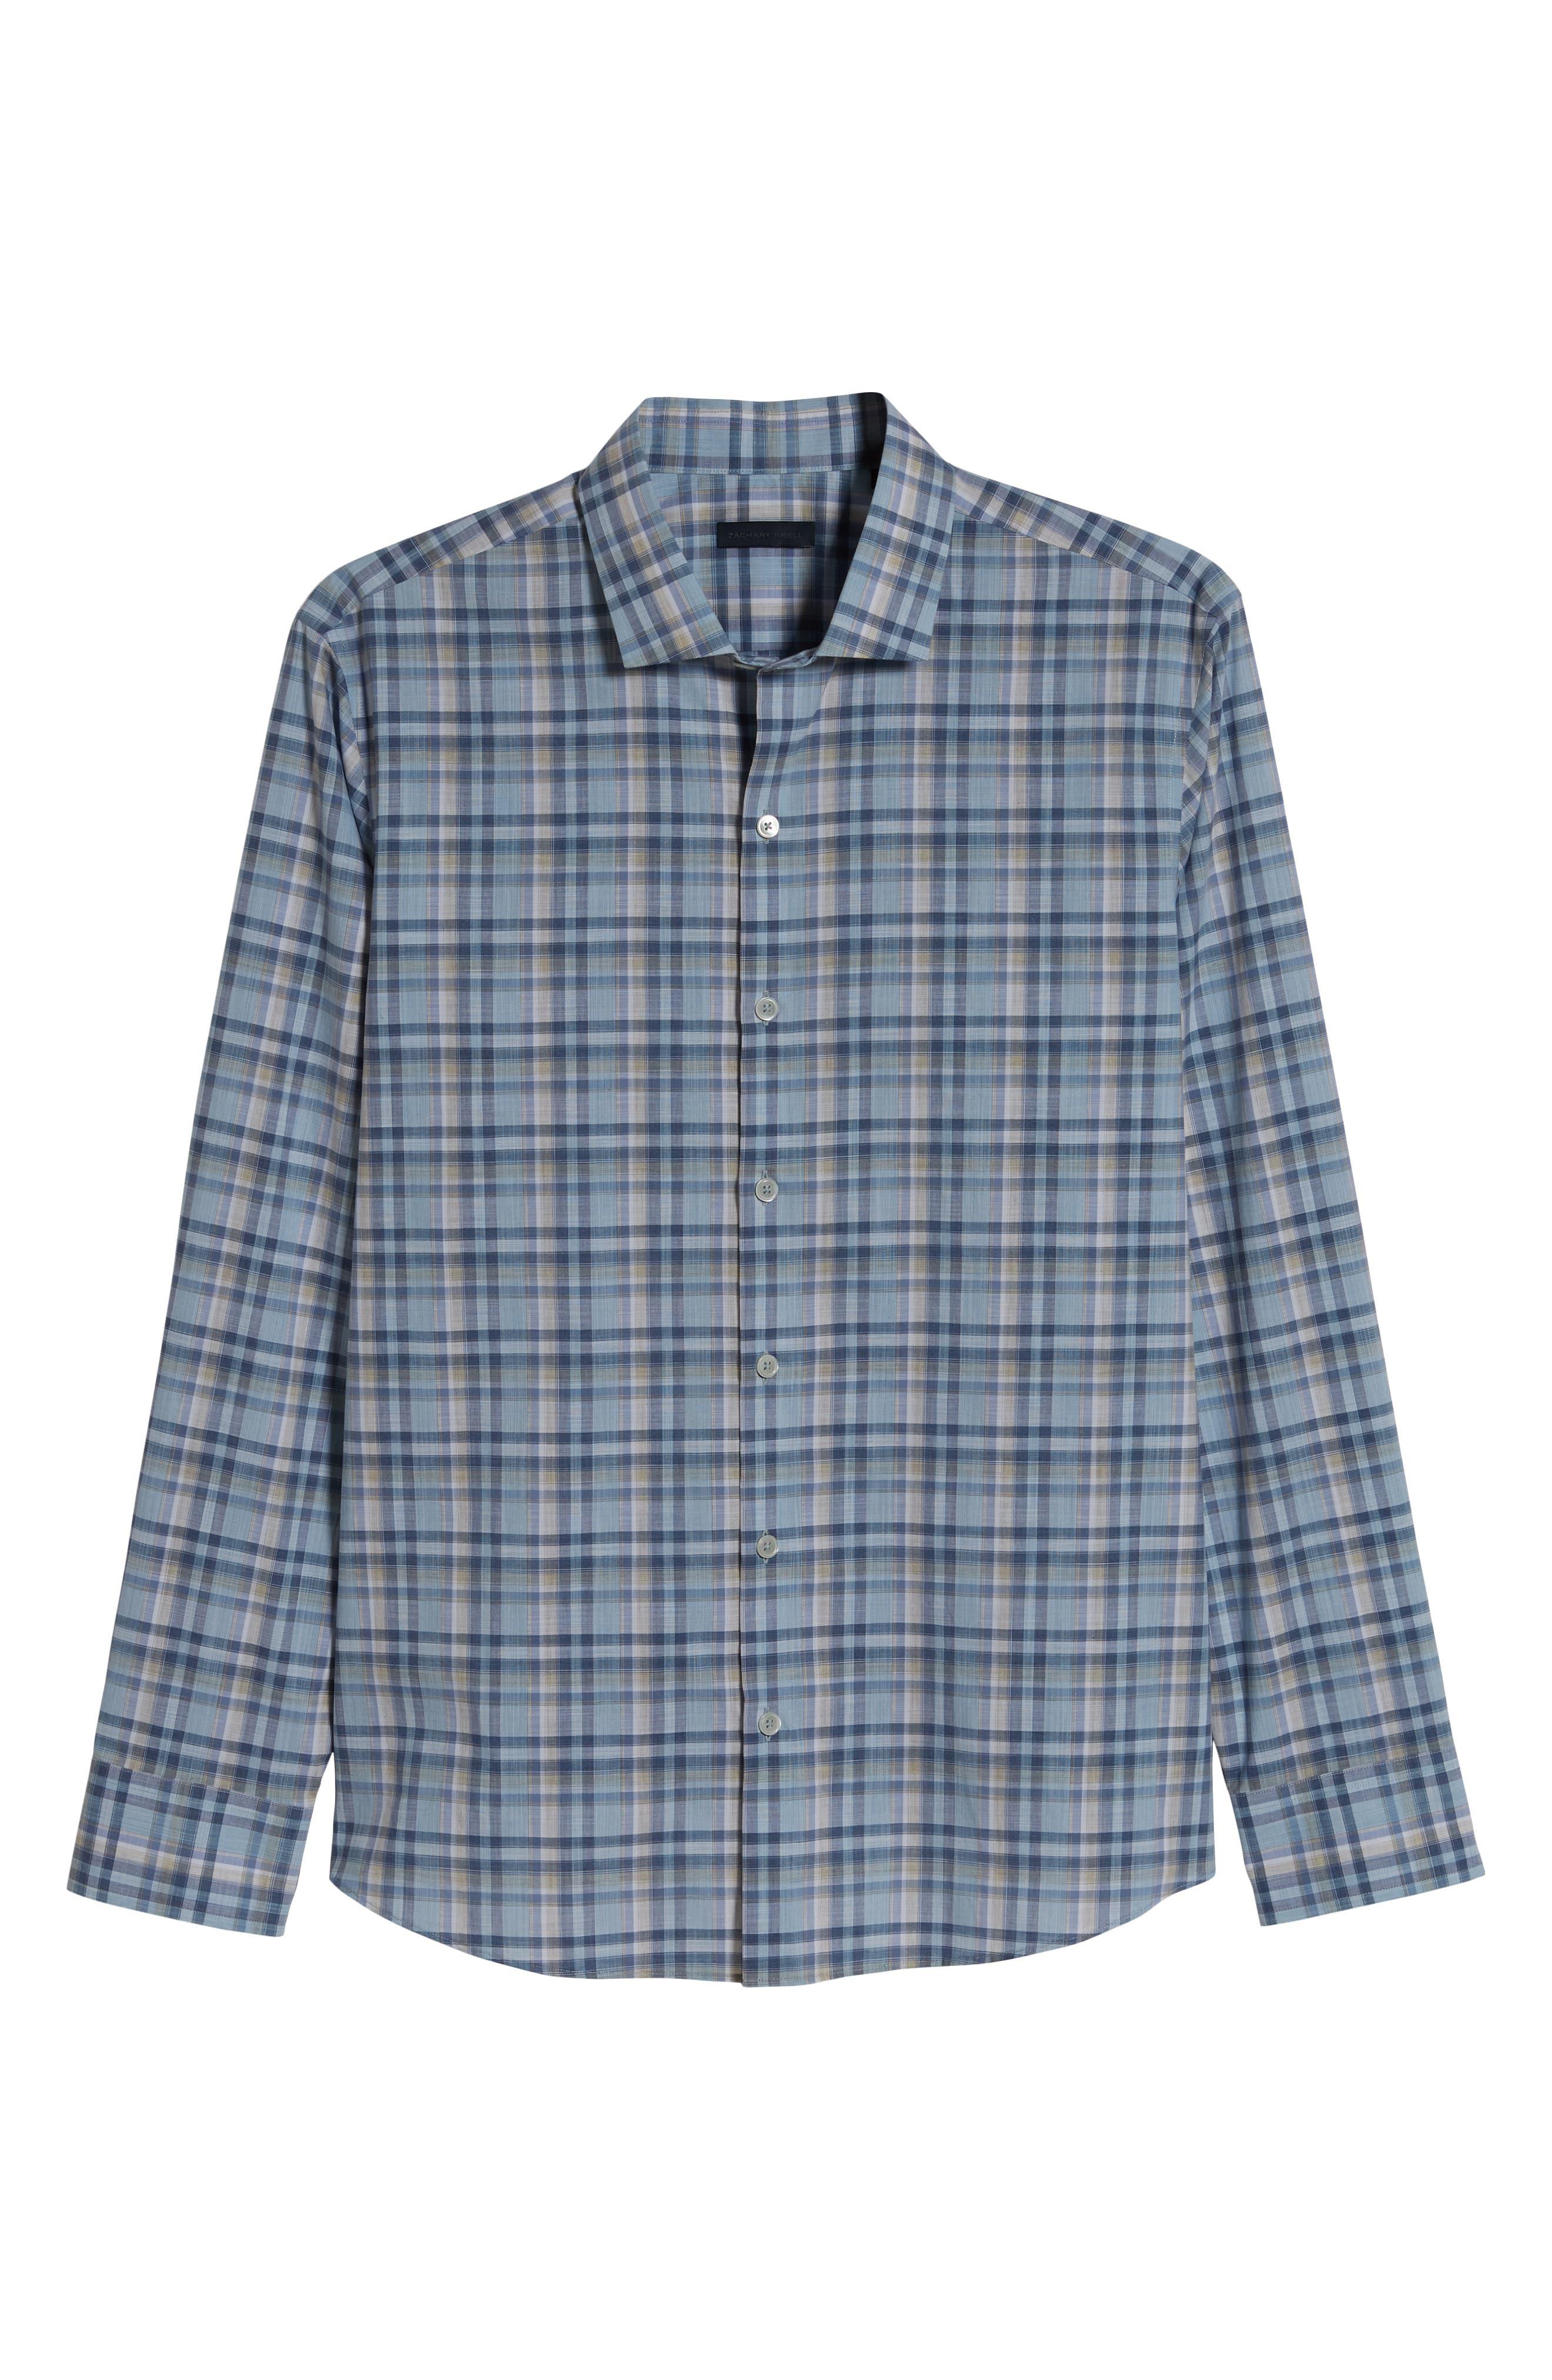 ZACHARY PRELL, Anthony Regular Fit Plaid Sport Shirt, Alternate thumbnail 5, color, LT BLUE